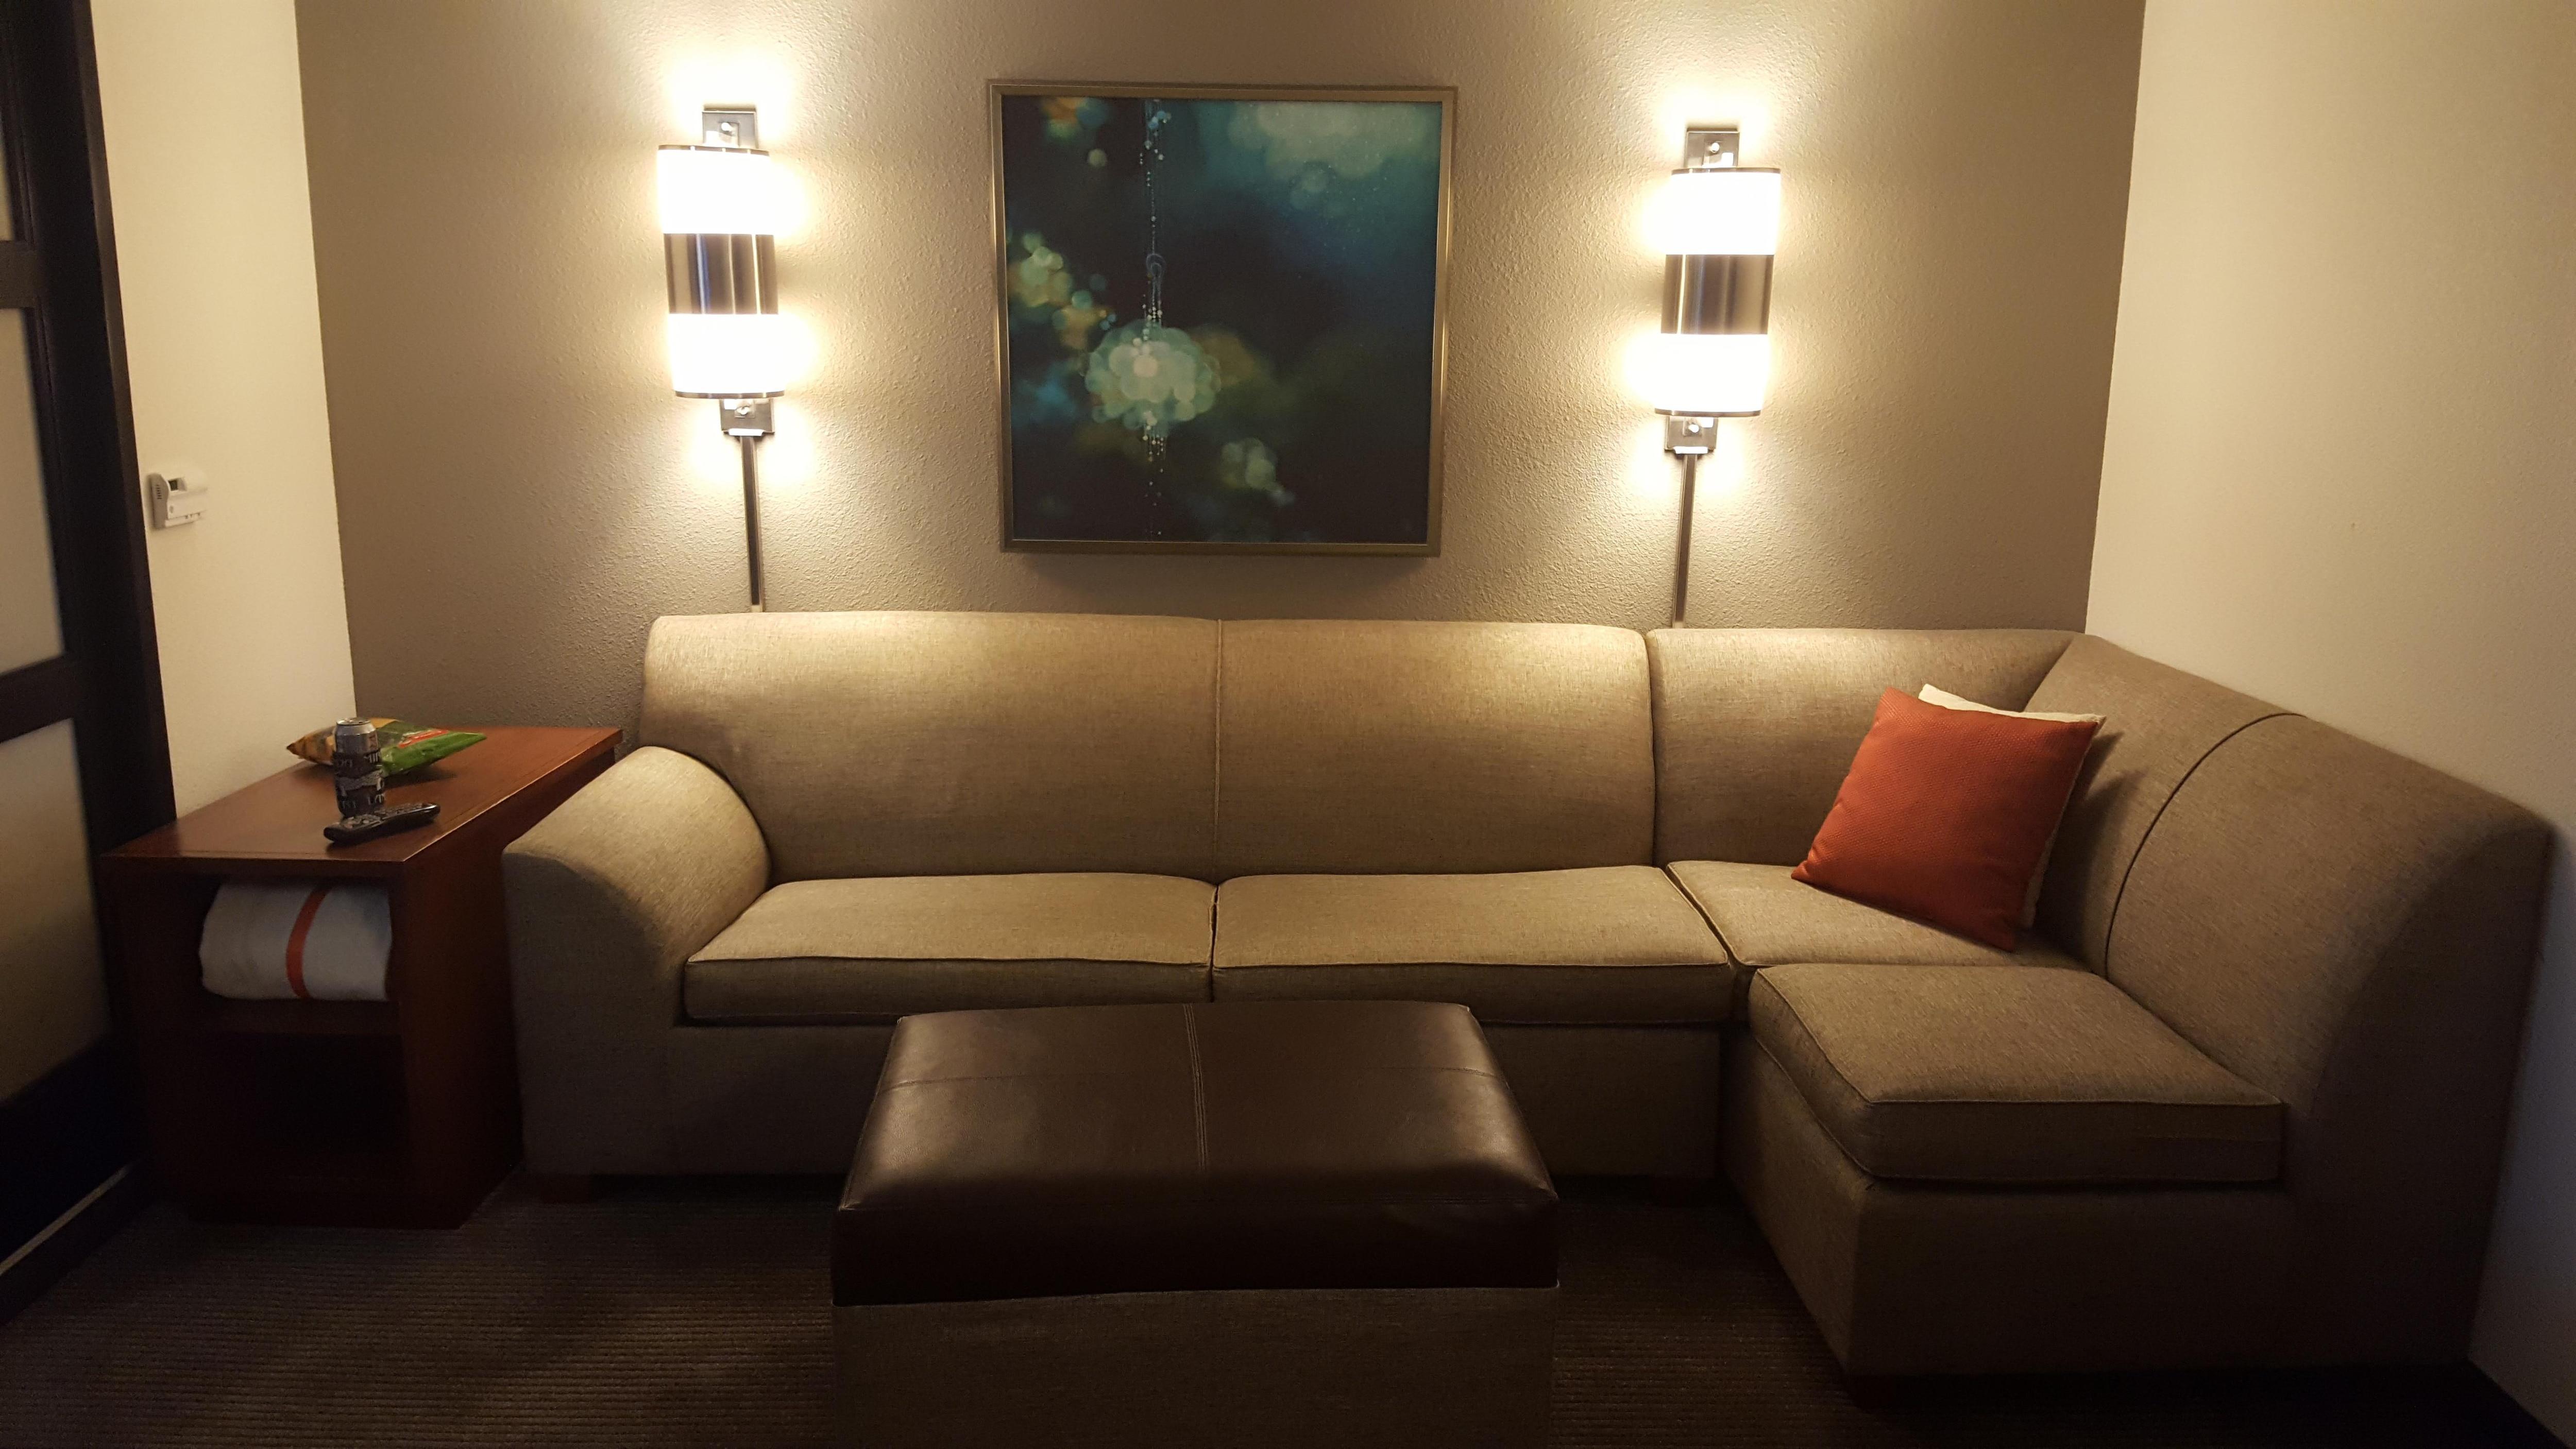 Classy sofa!